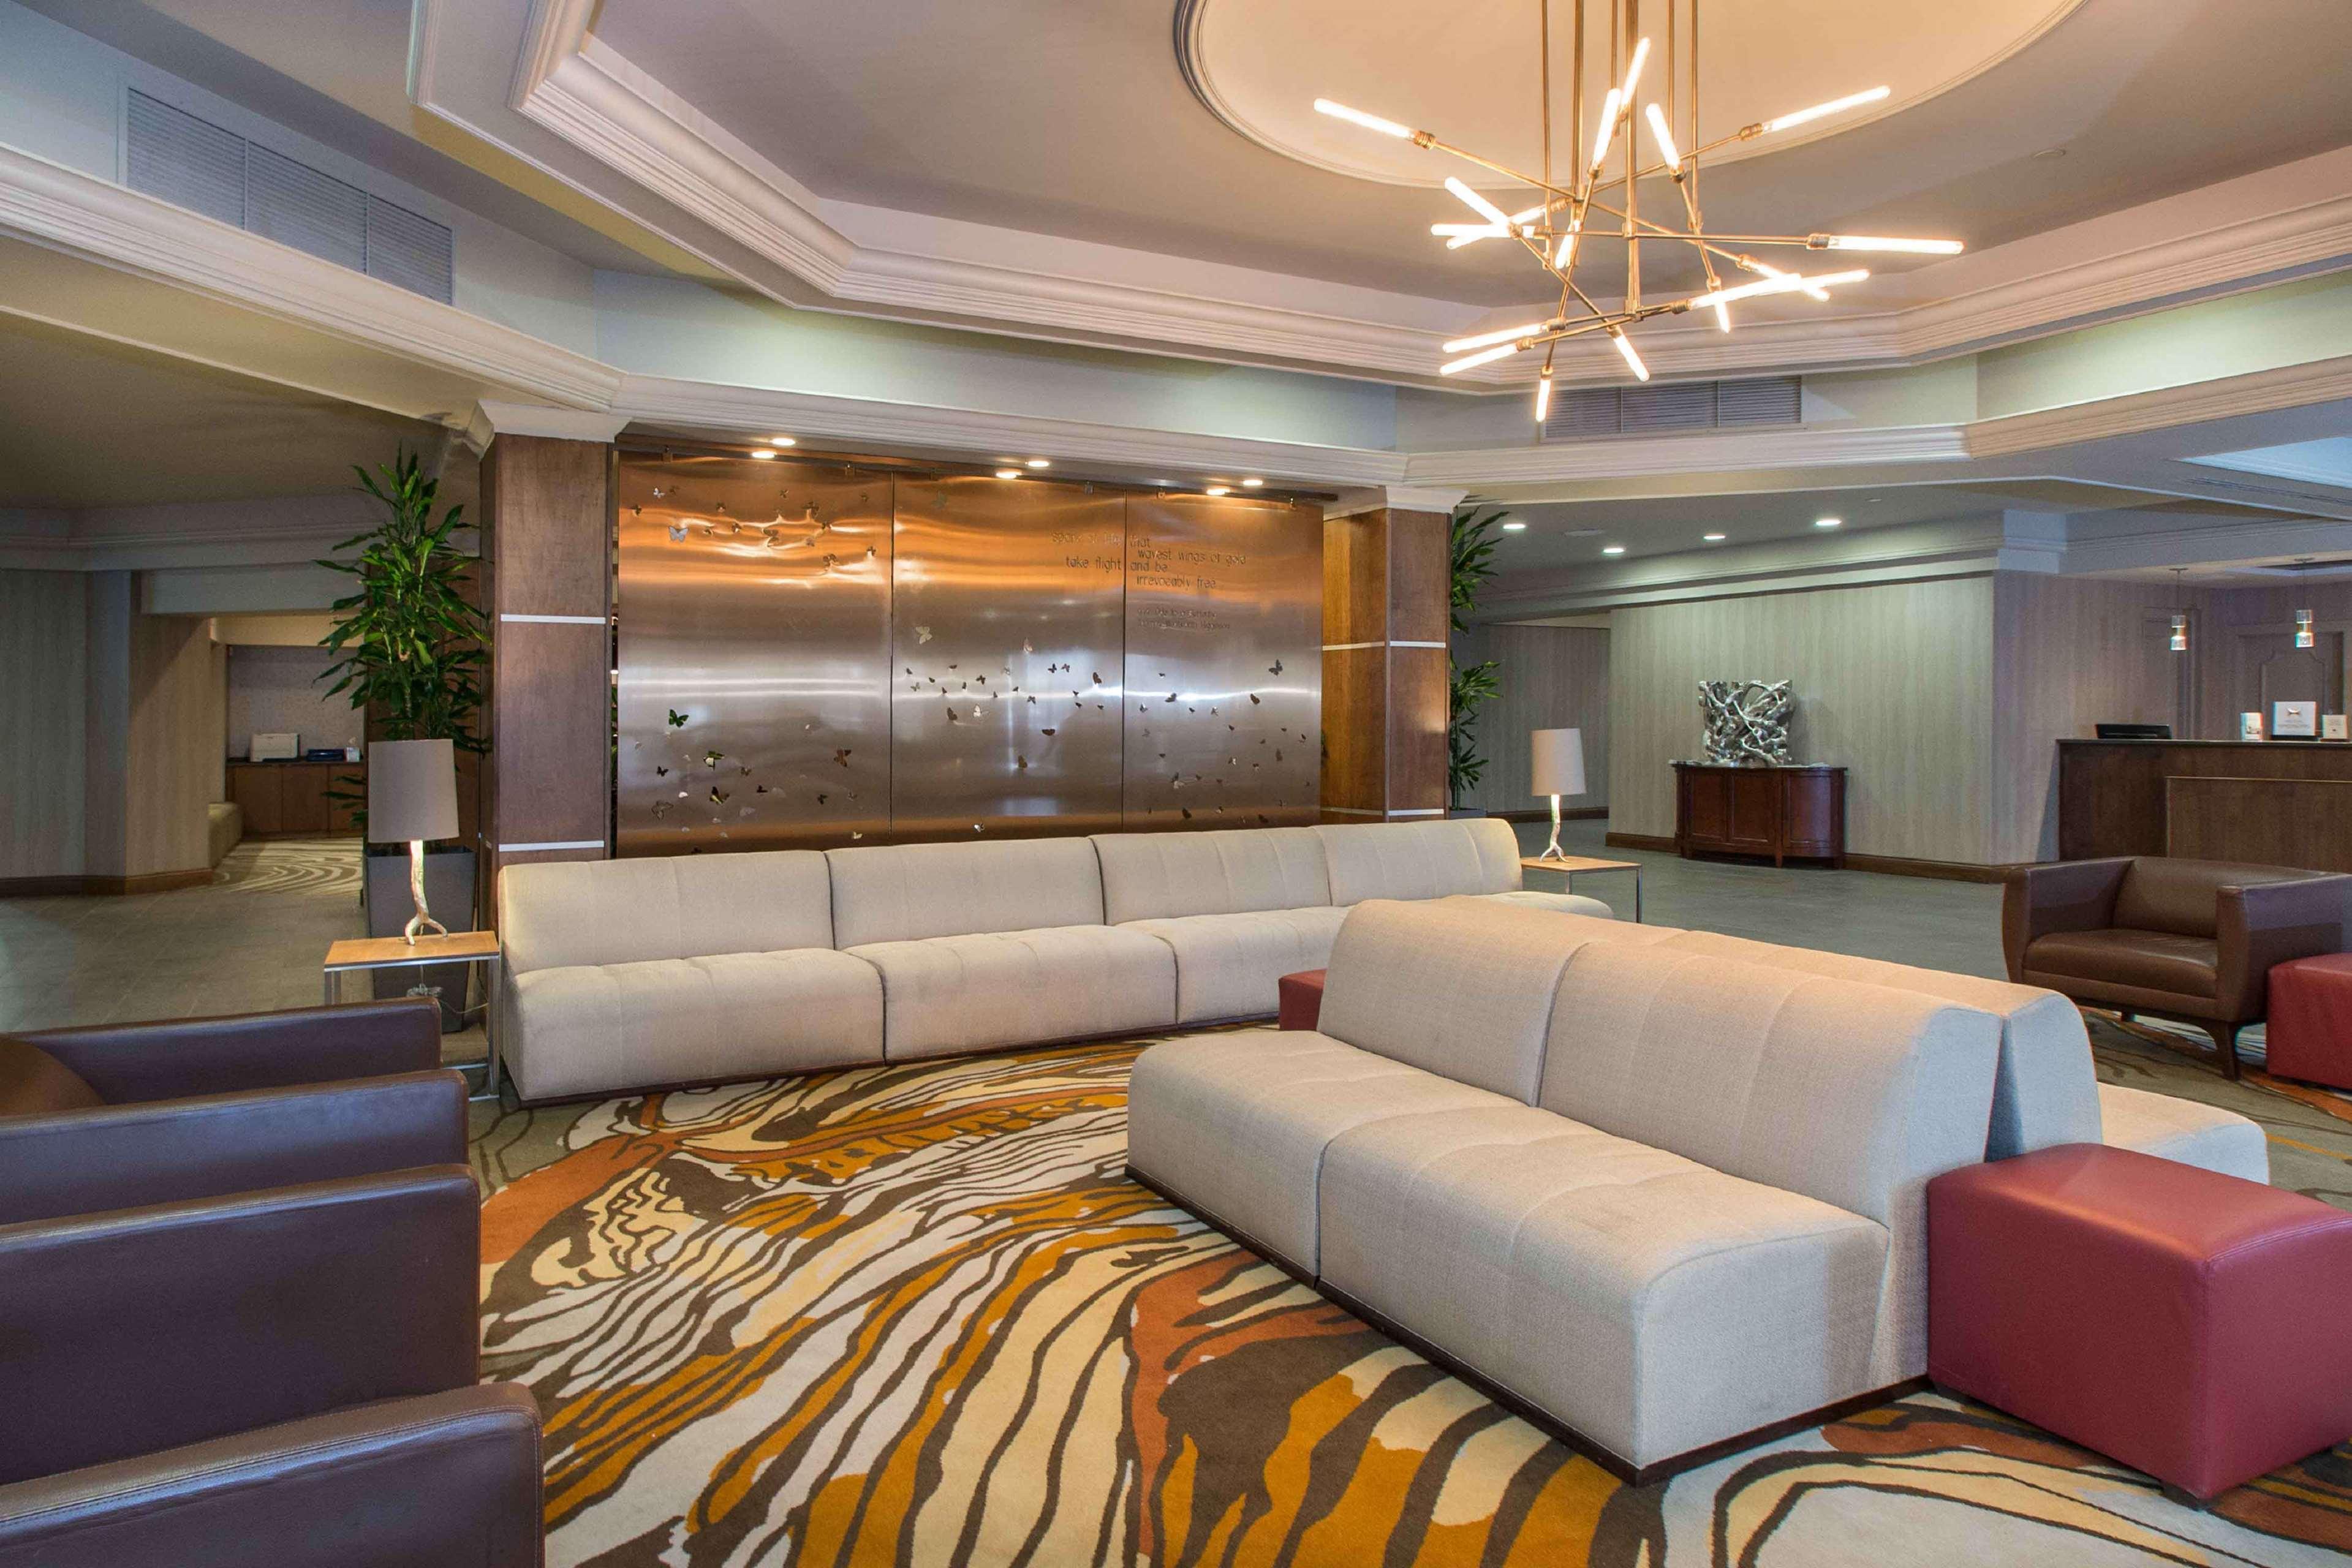 DoubleTree by Hilton Hotel Cleveland East Beachwood image 2